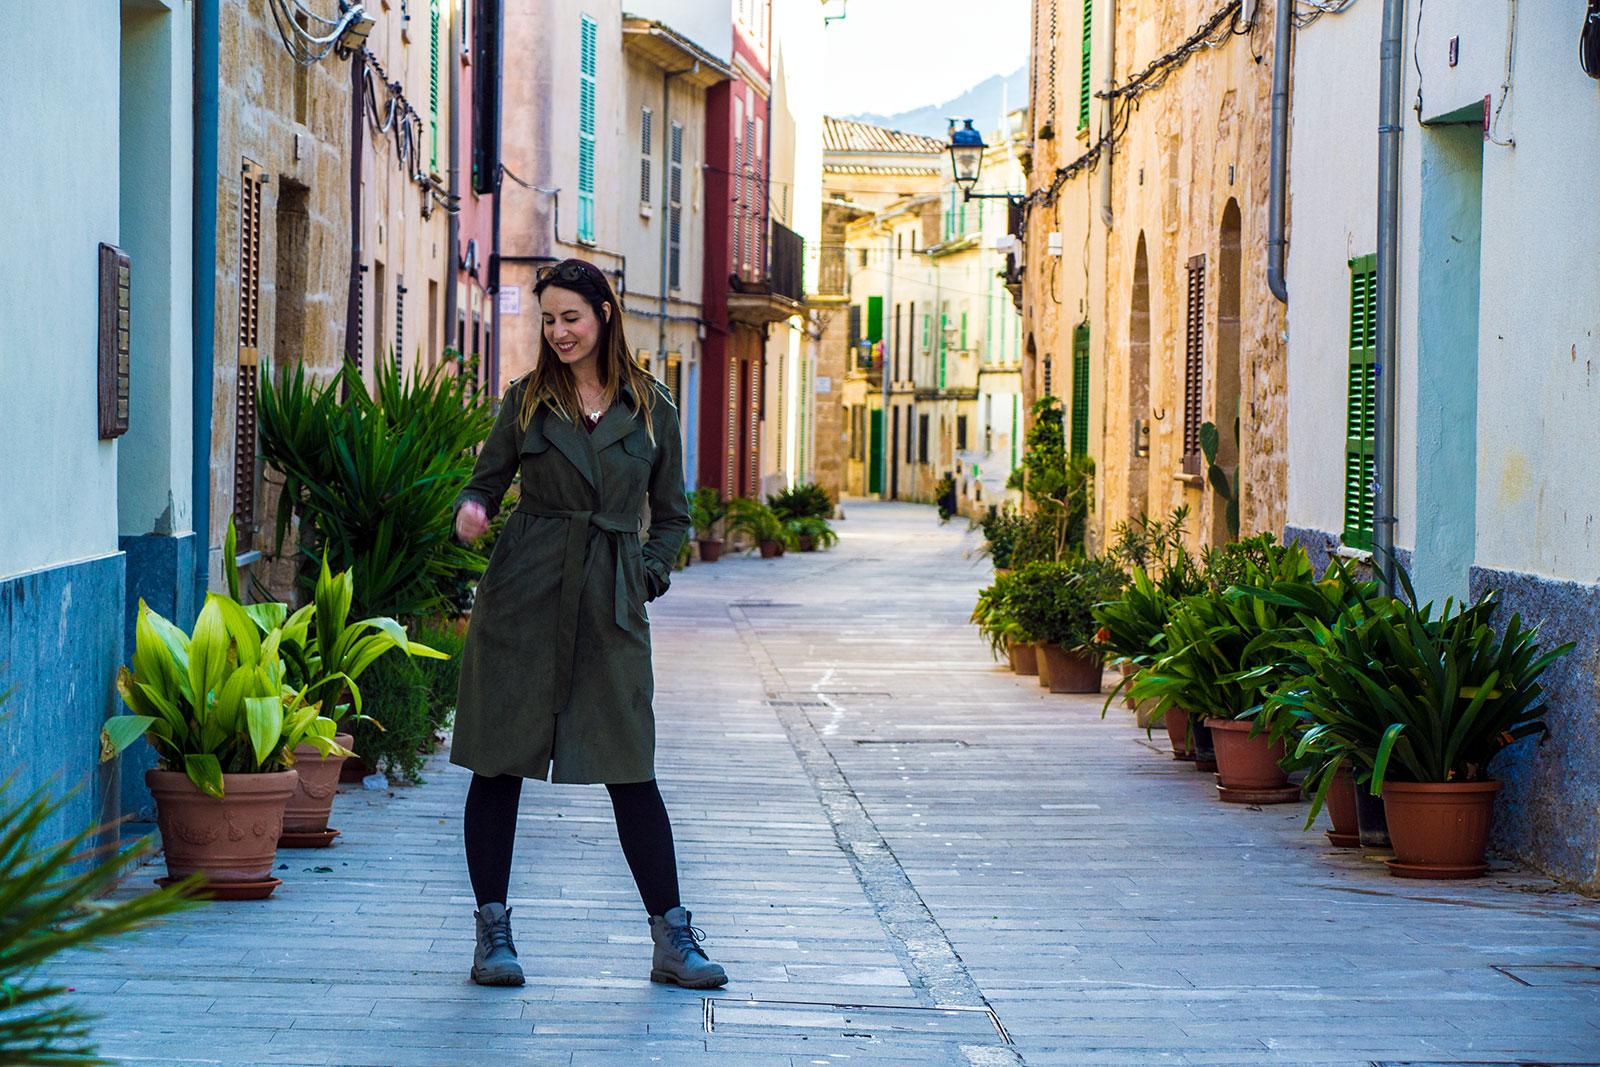 Calles coloridas de Alcudia